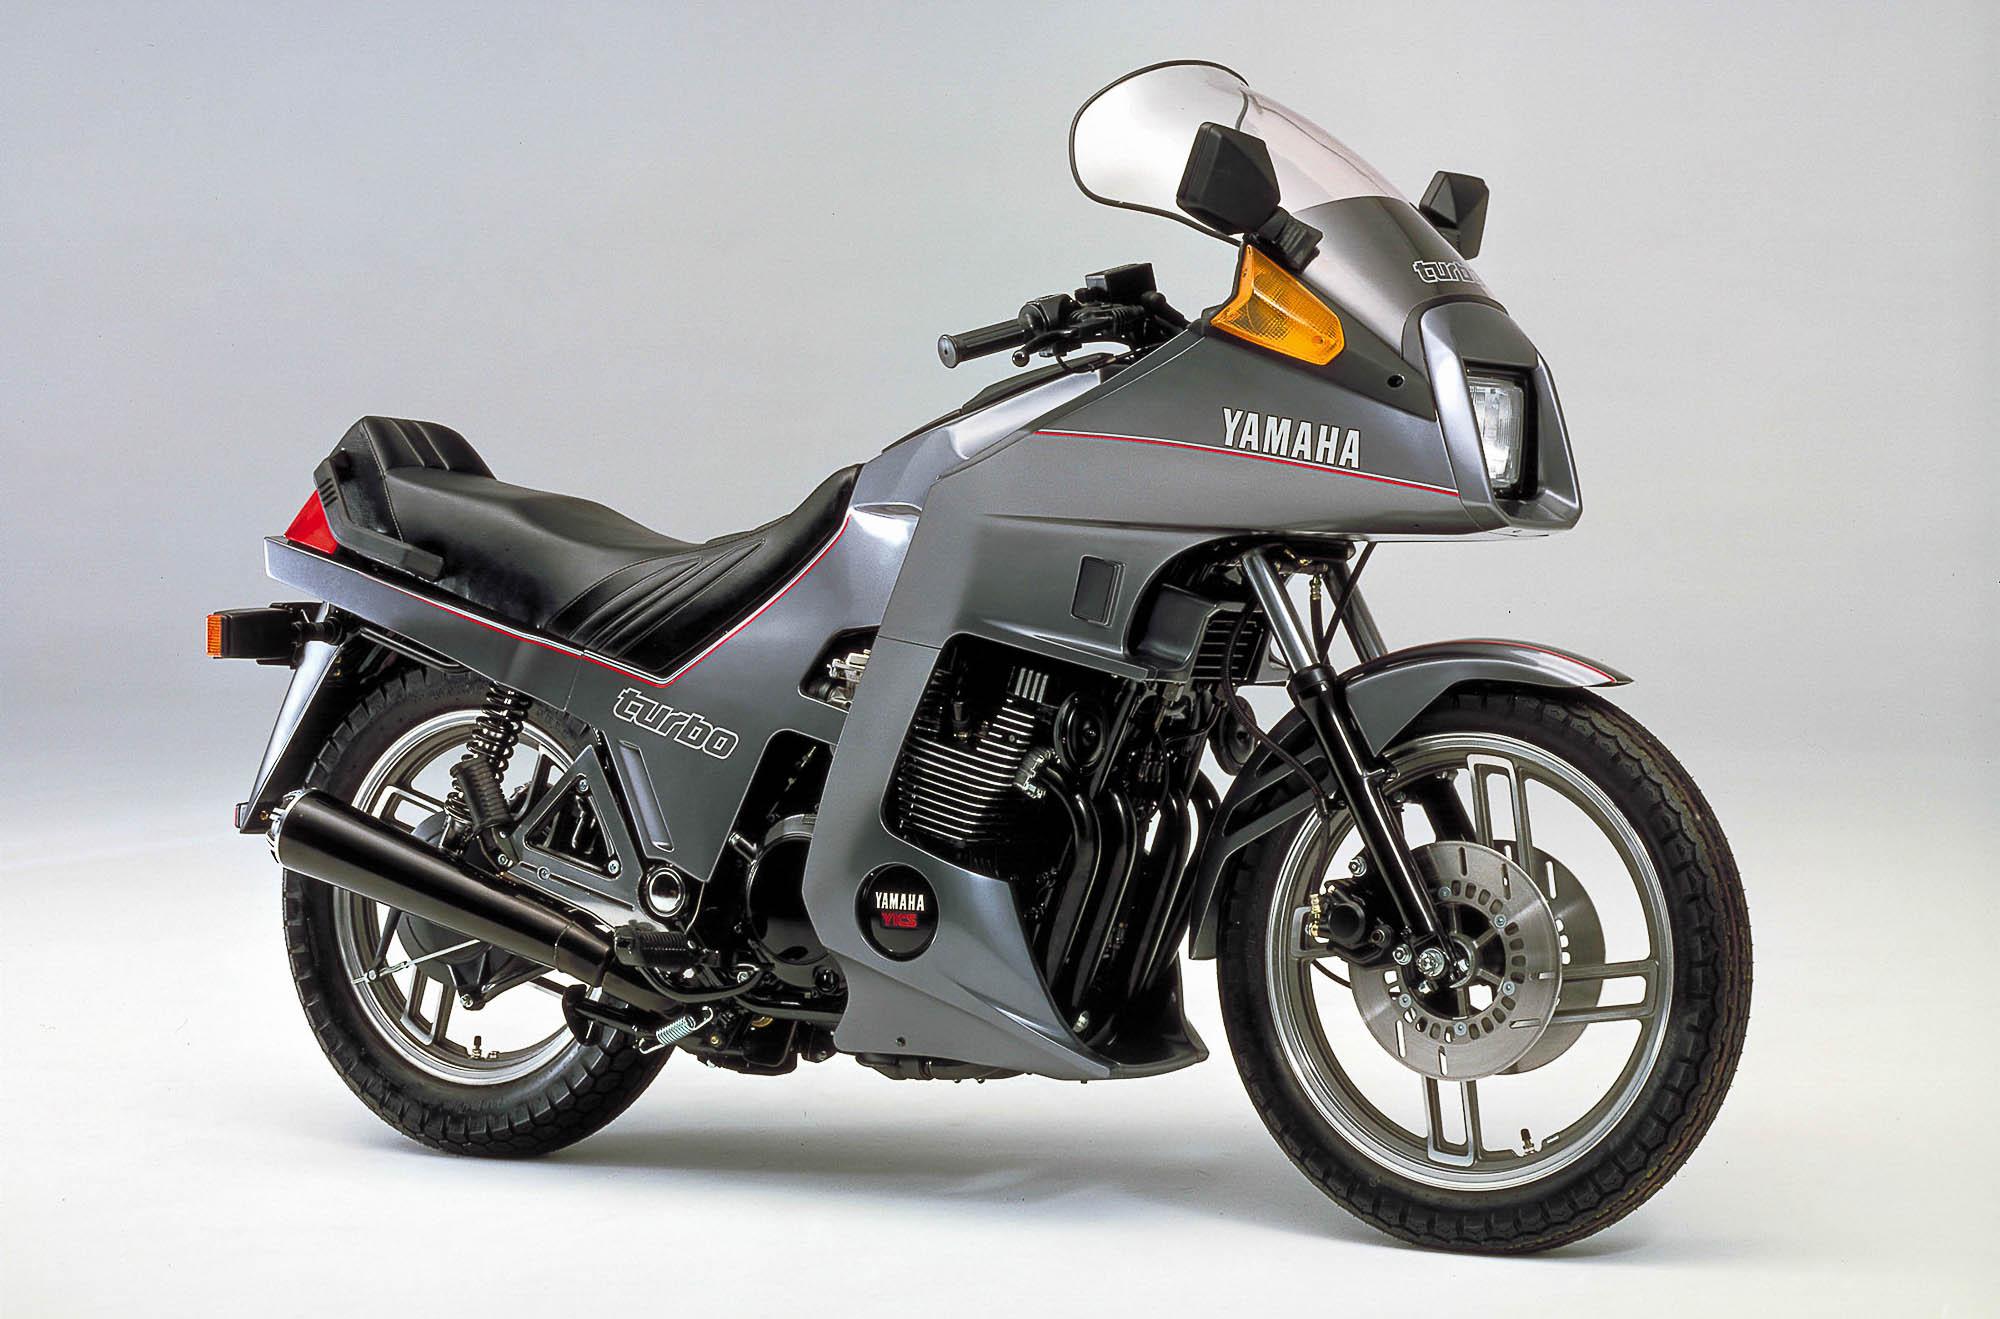 YAMAHA XJ 650 T (1982 - 1984)